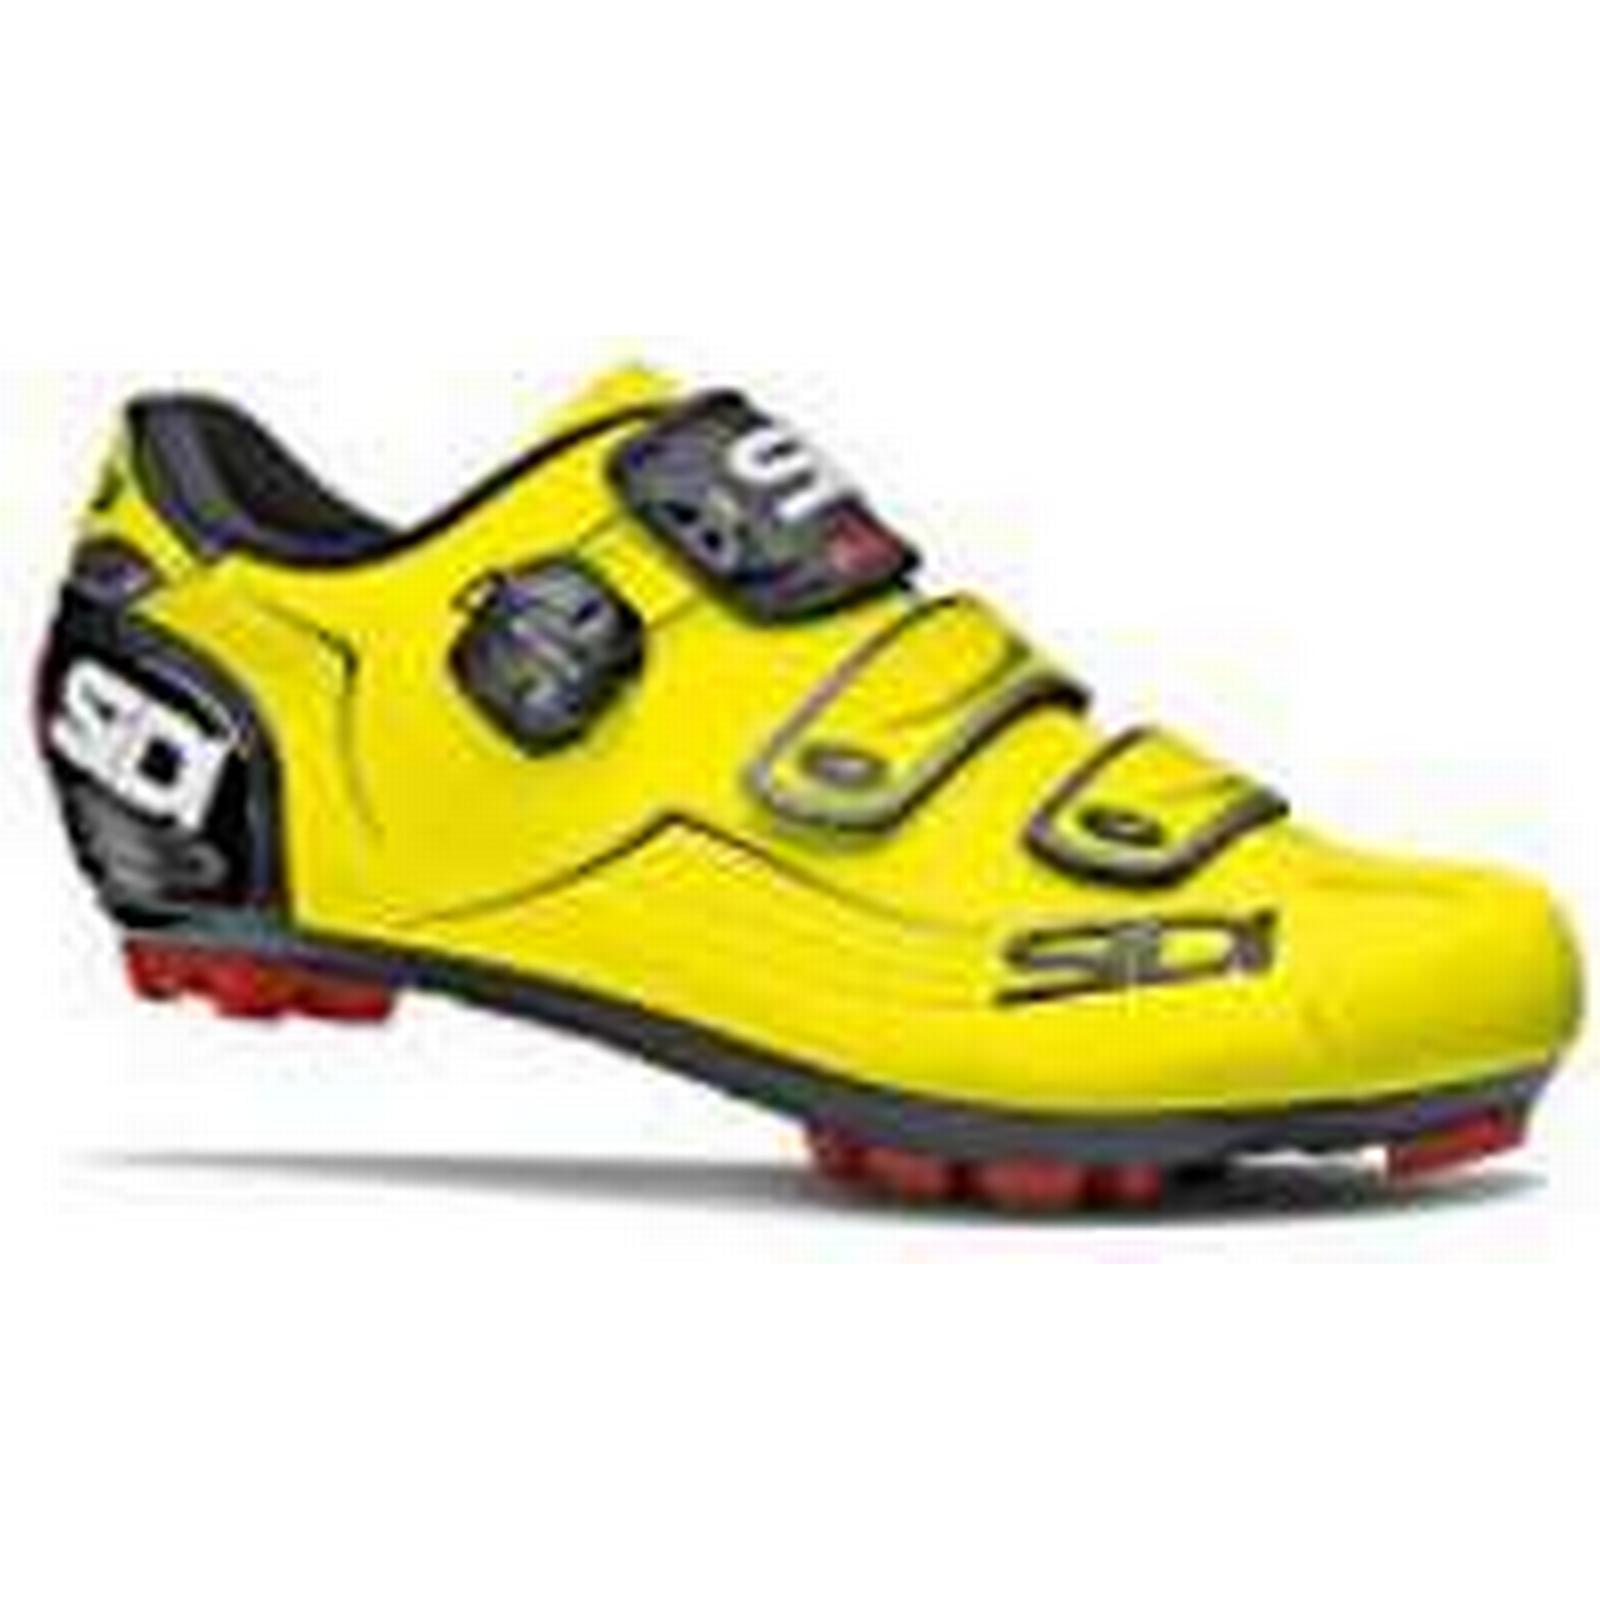 Sidi Trace MTB Shoes - Yellow - Fluo/Black - EU 47 - Yellow Yellow Fluo/Black 6f5595